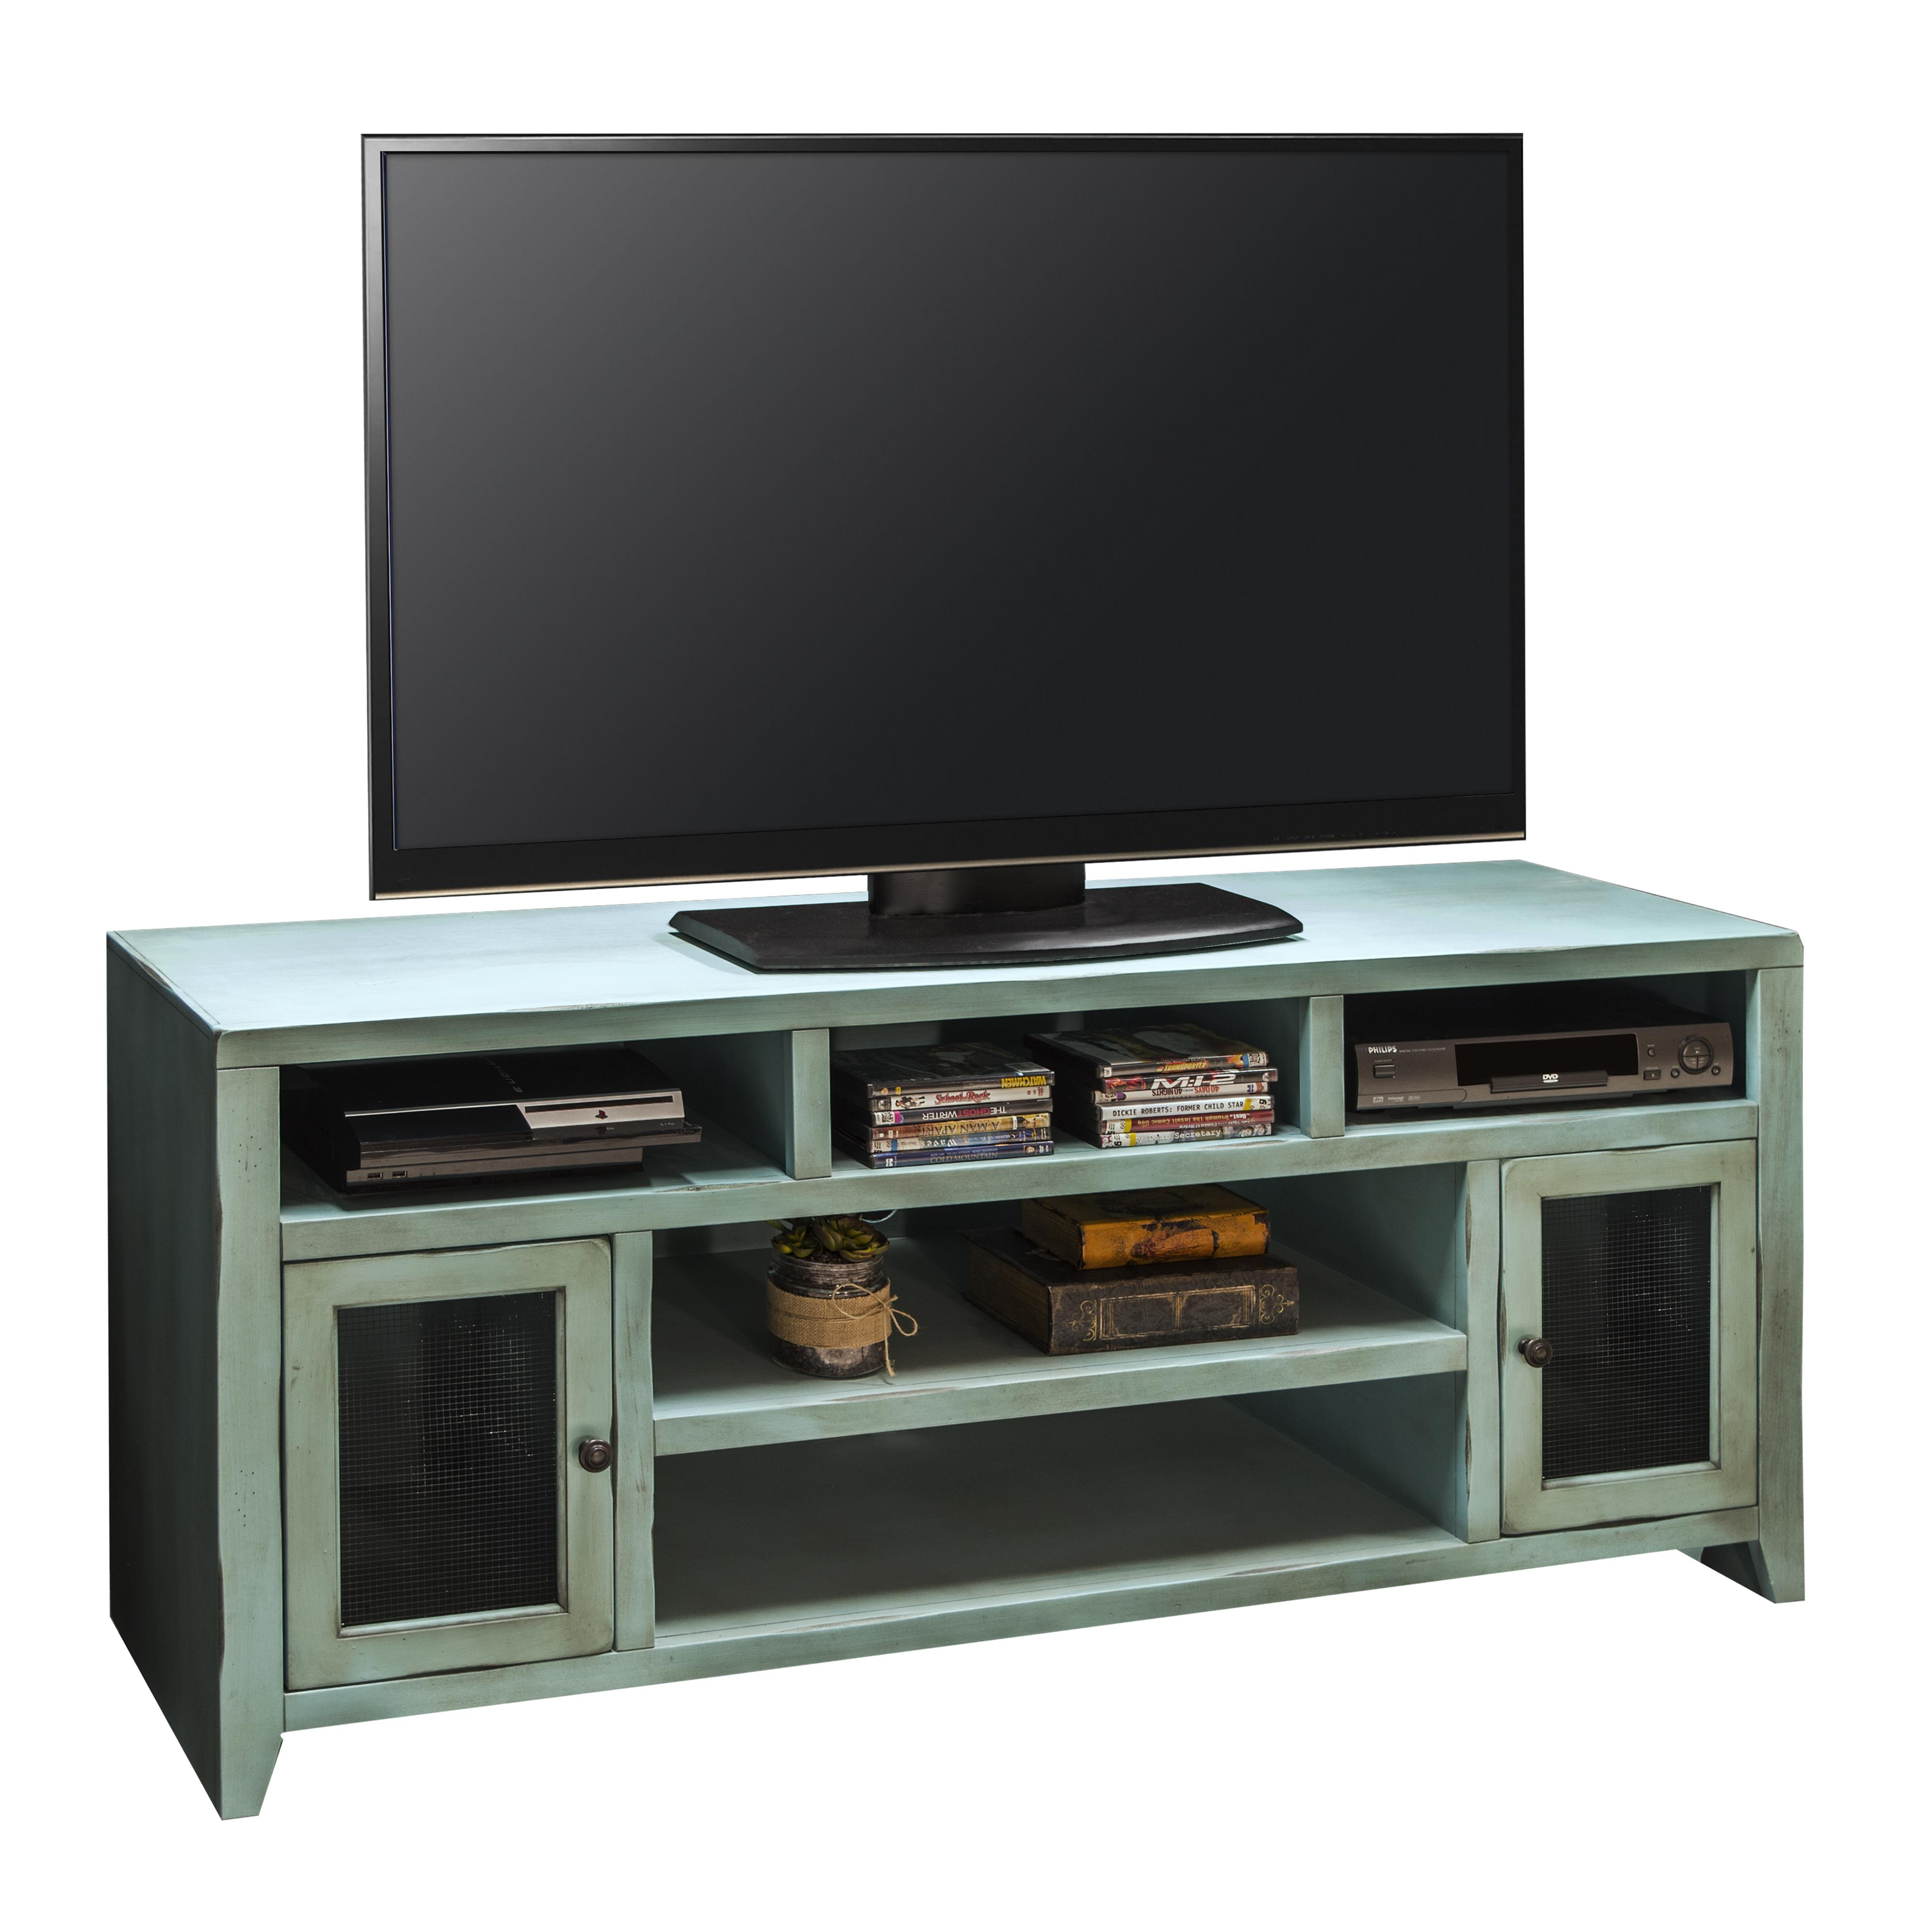 "Legends Furniture Calistoga Collection Calistoga 66"" TV Console - Item Number: CA1209-RBL"